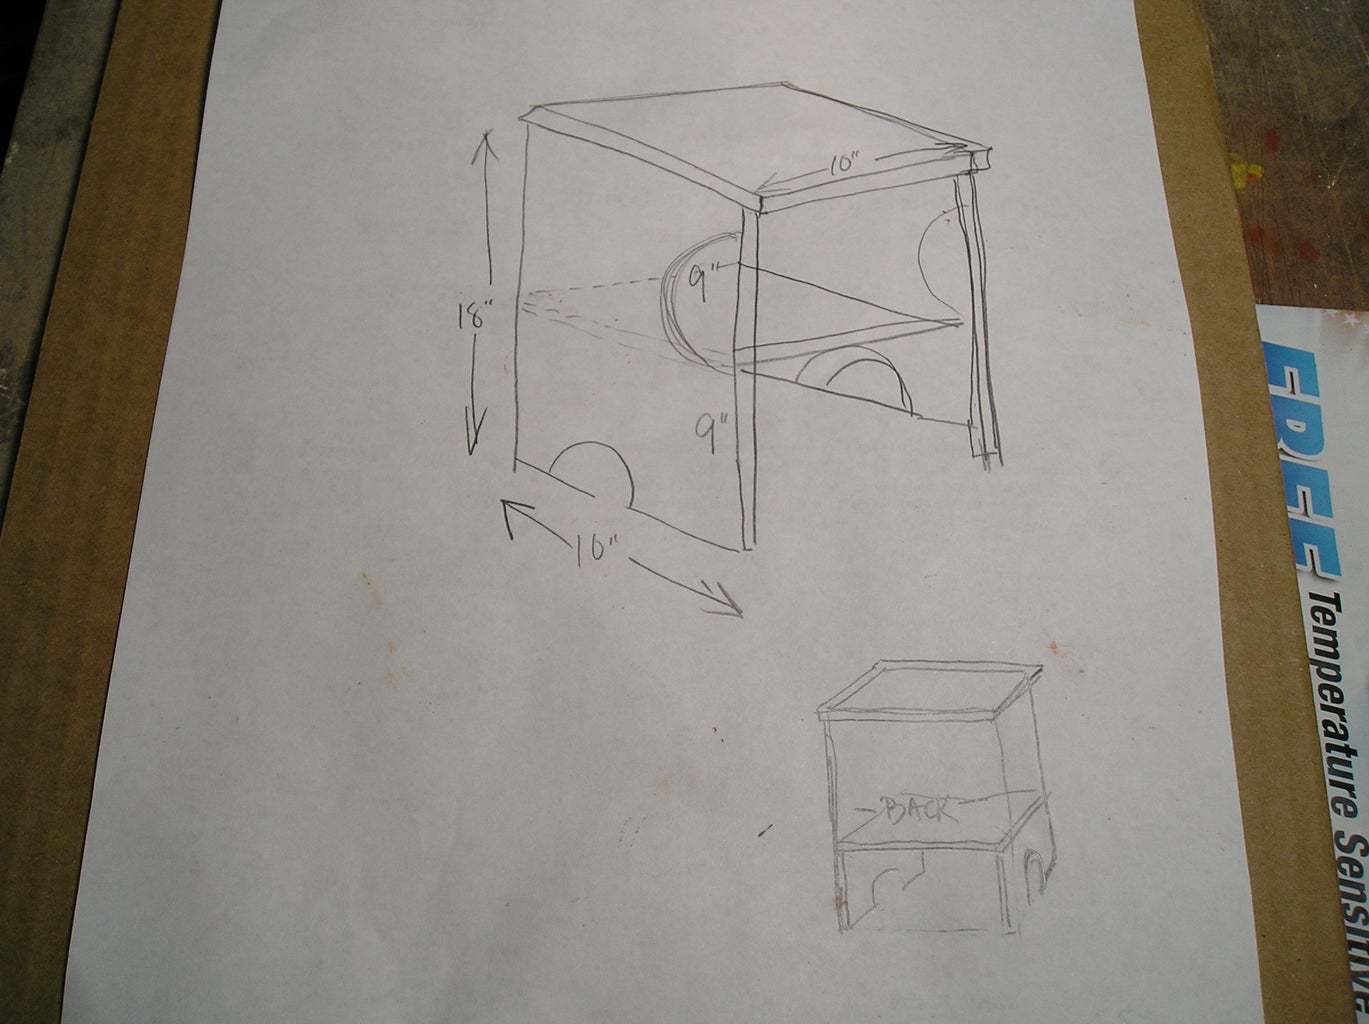 Draw the Design